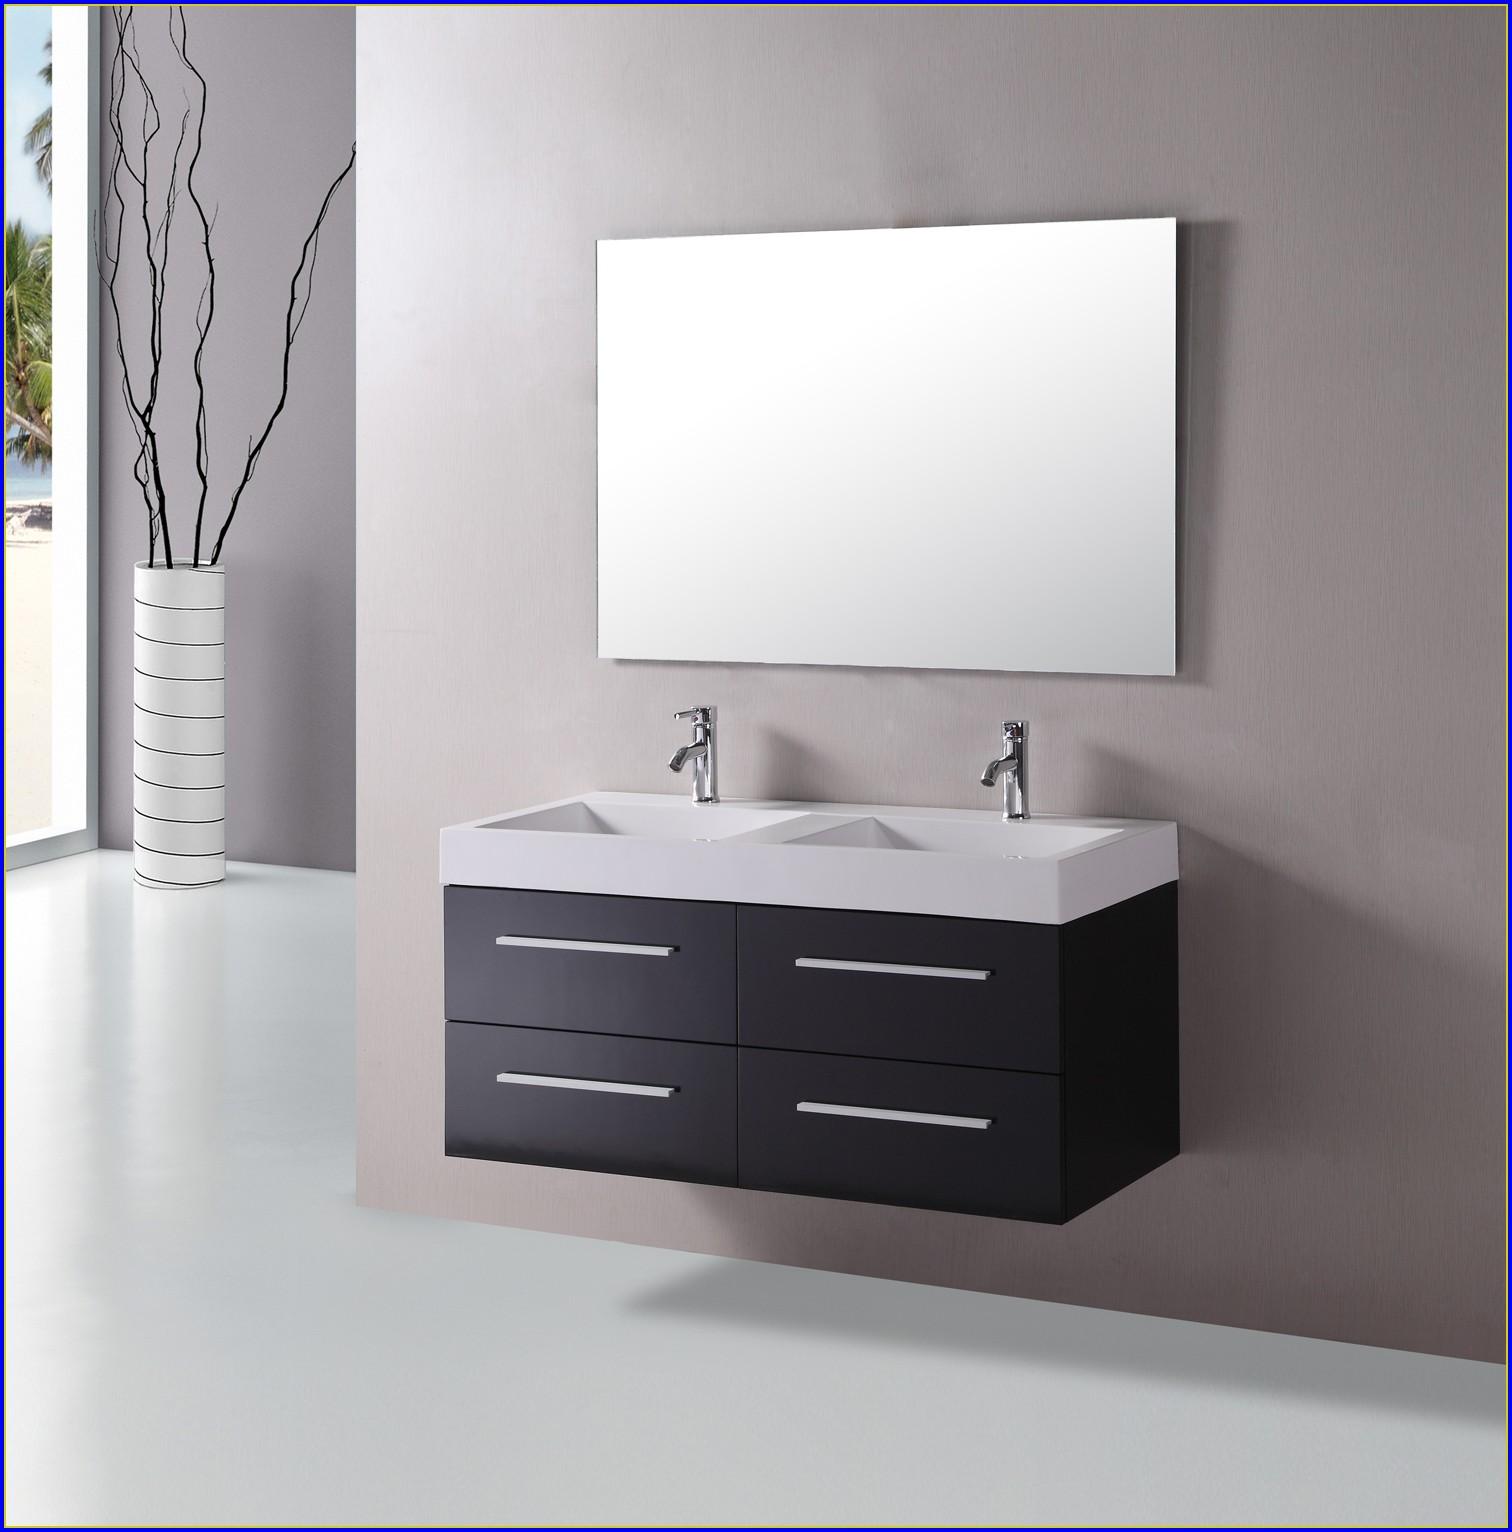 Ikea Bathroom Sink Unit